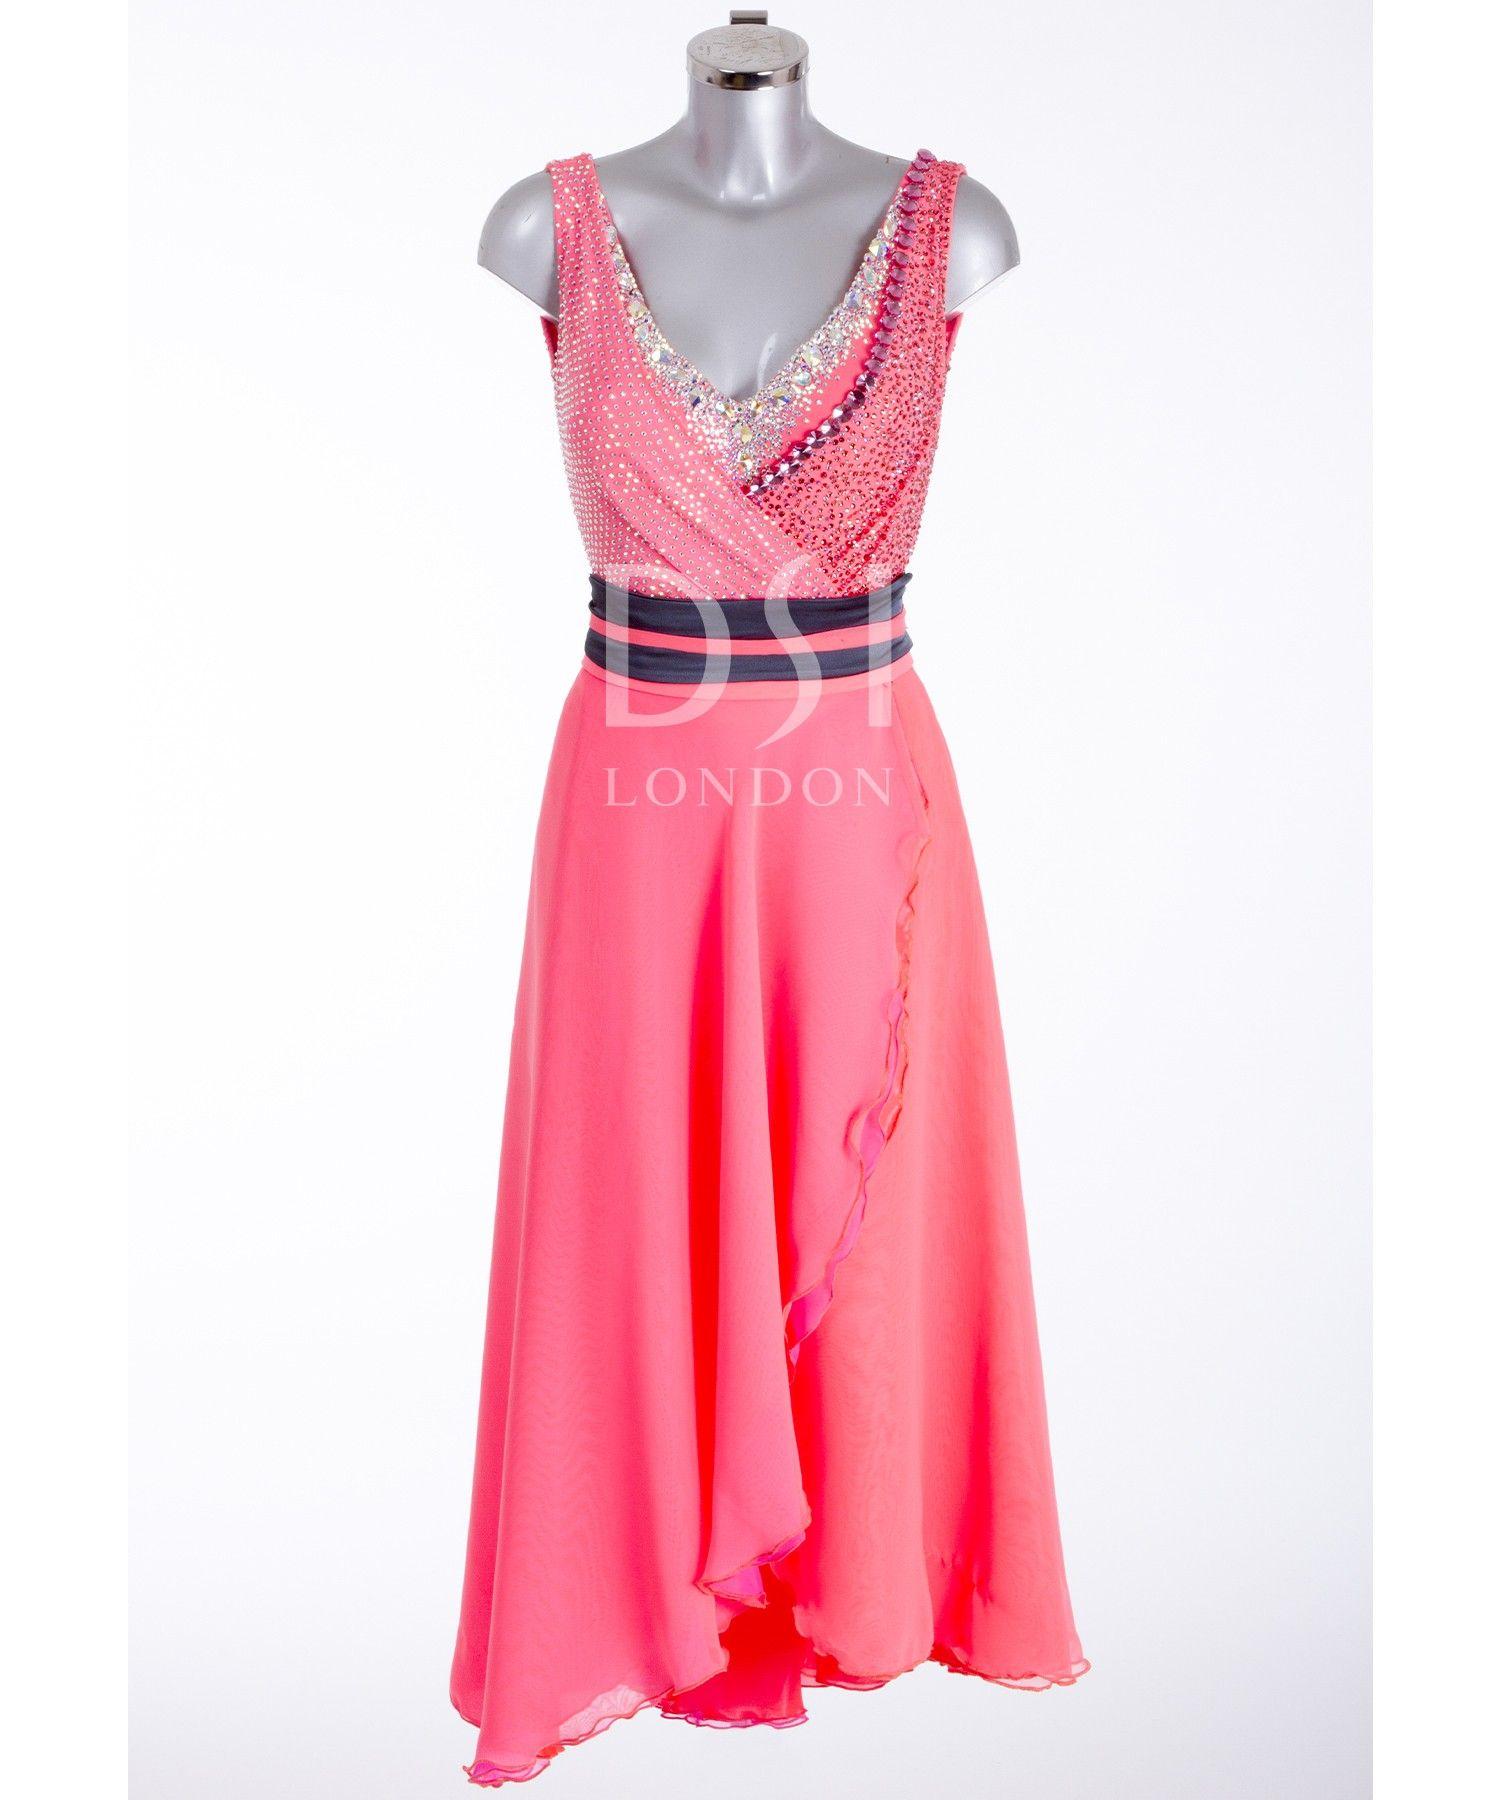 394585 Fuchsia Ballroom Dress | Ballroom dresses for sale ...